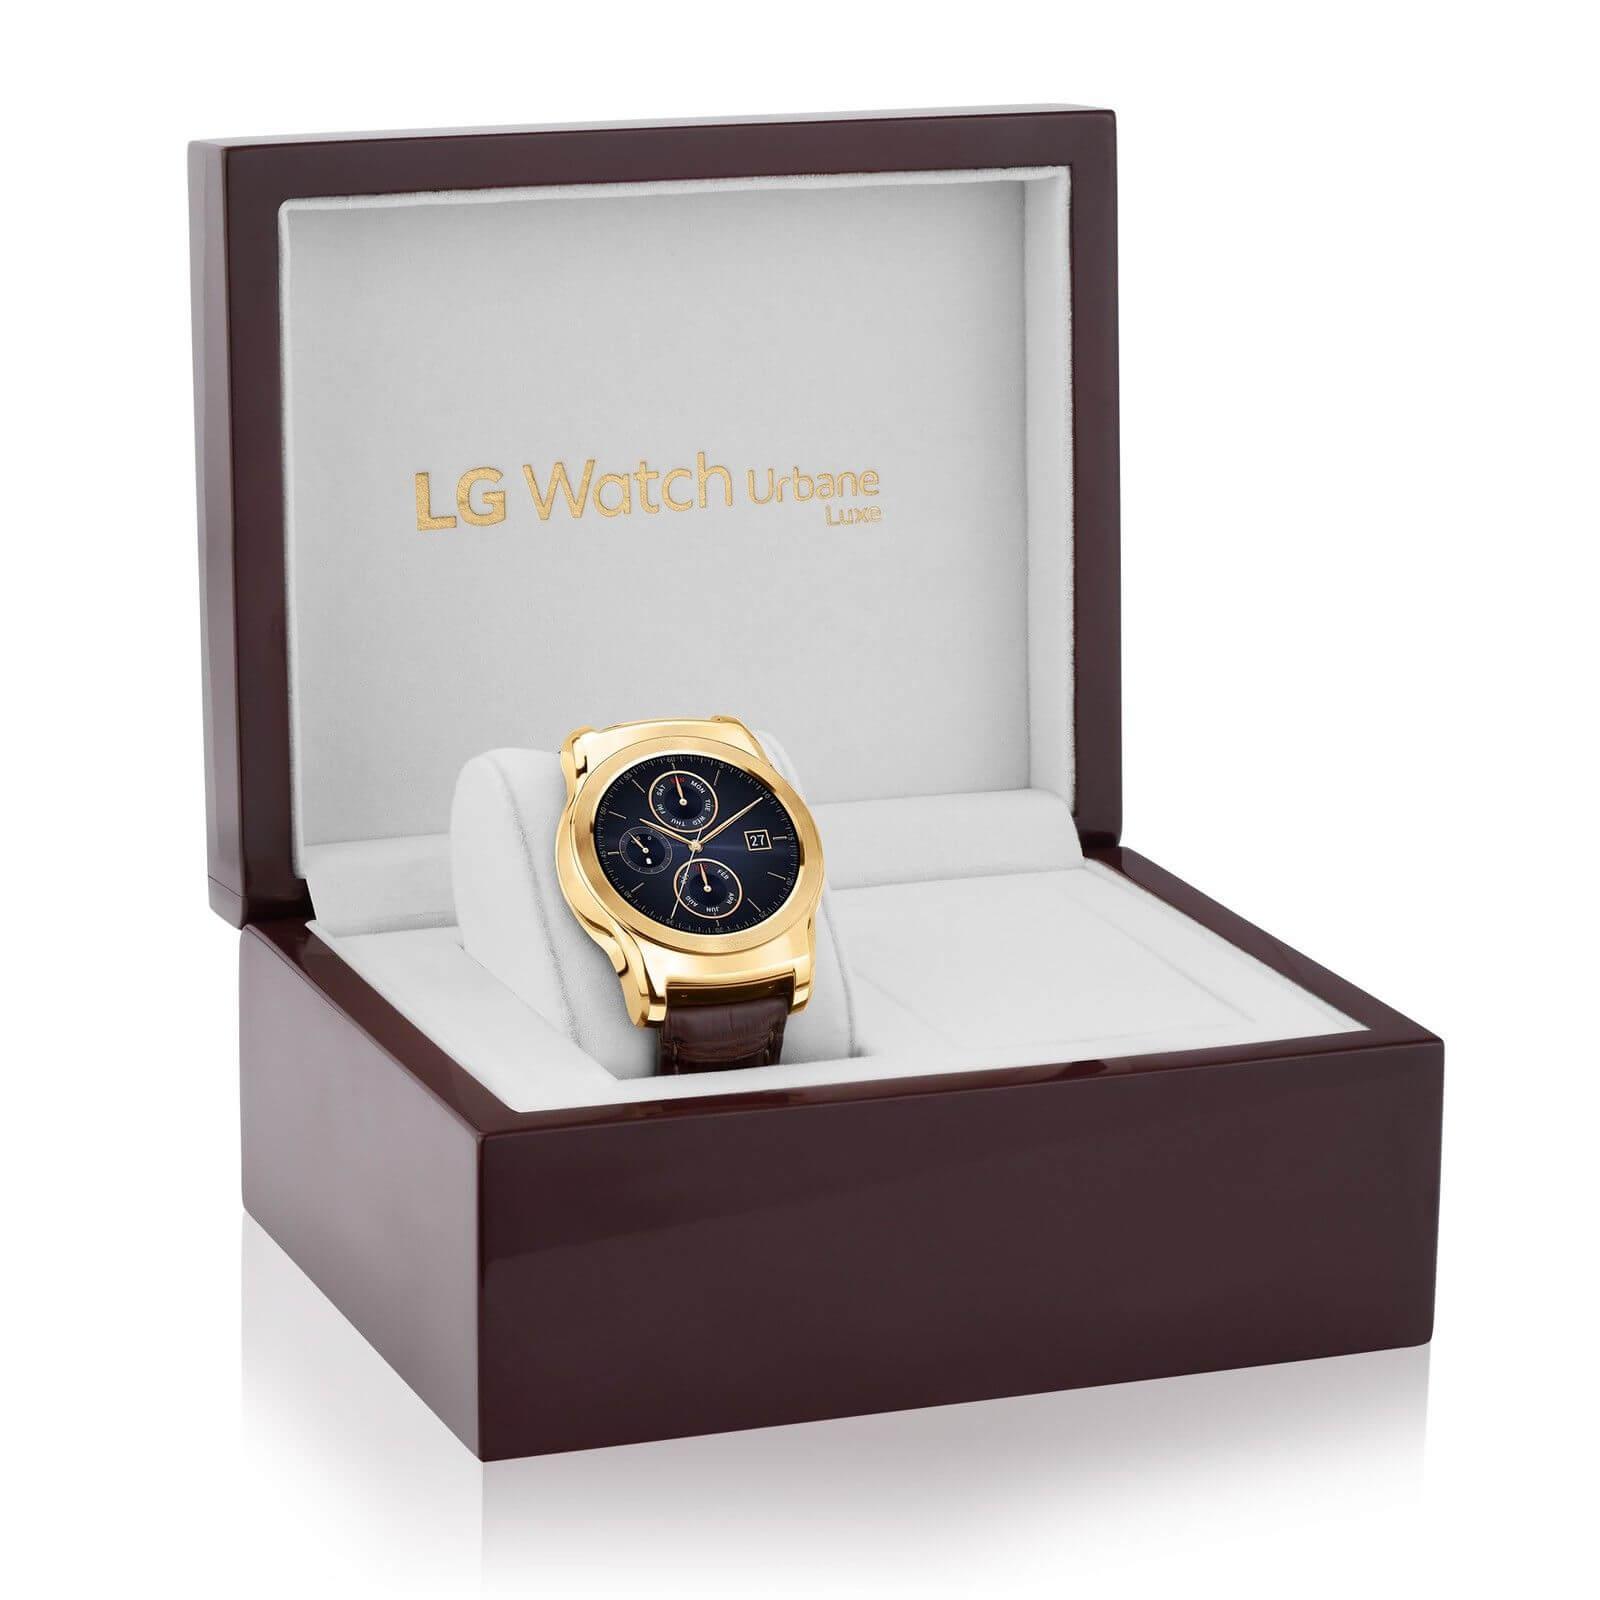 lg watch urbane luxe case - Conheça a nova safra de relógios inteligentes de 2015